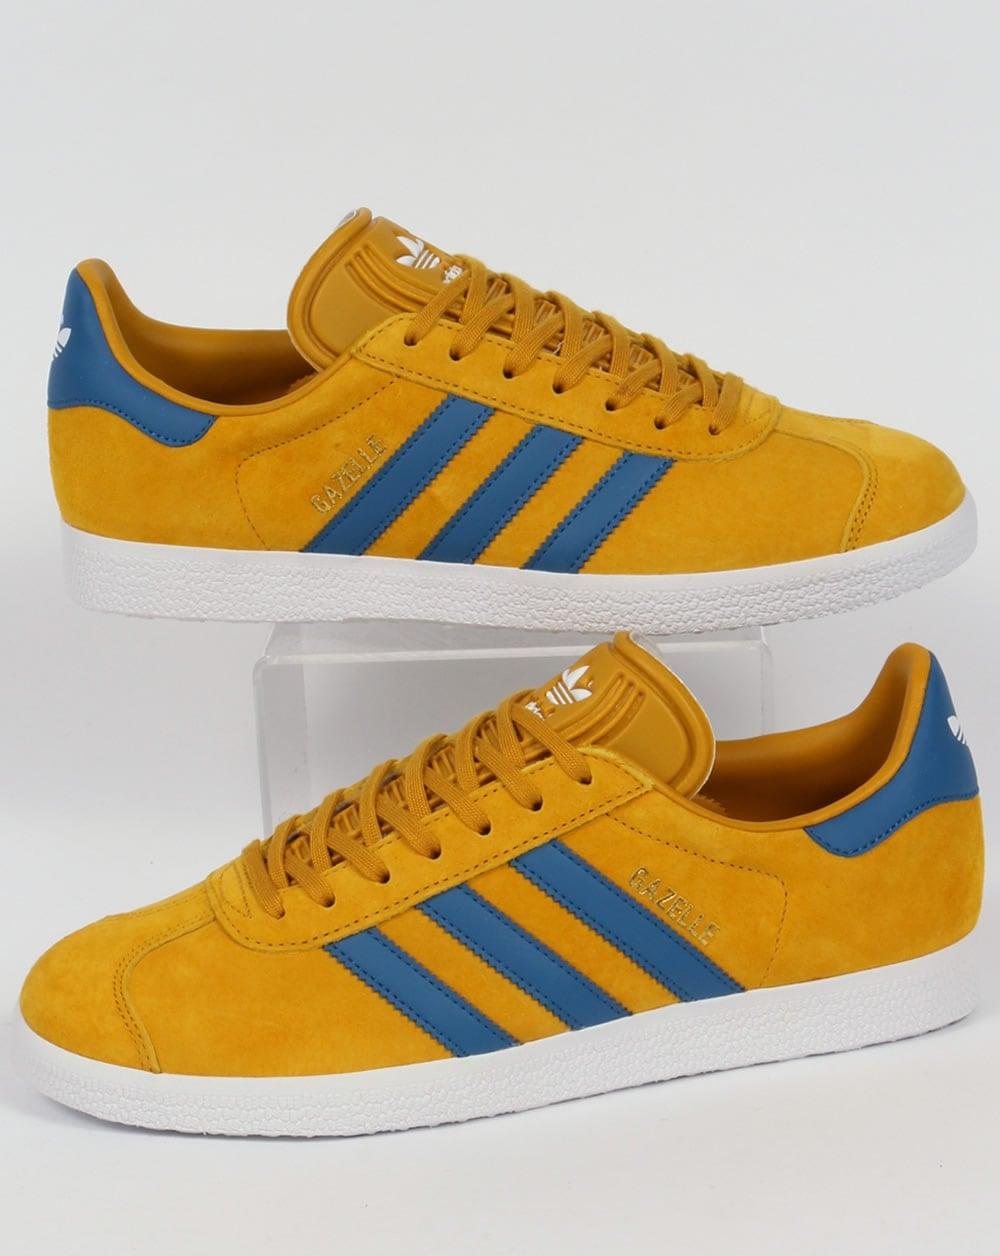 Adidas Gazelle Trainers Golden Yellow/Blue